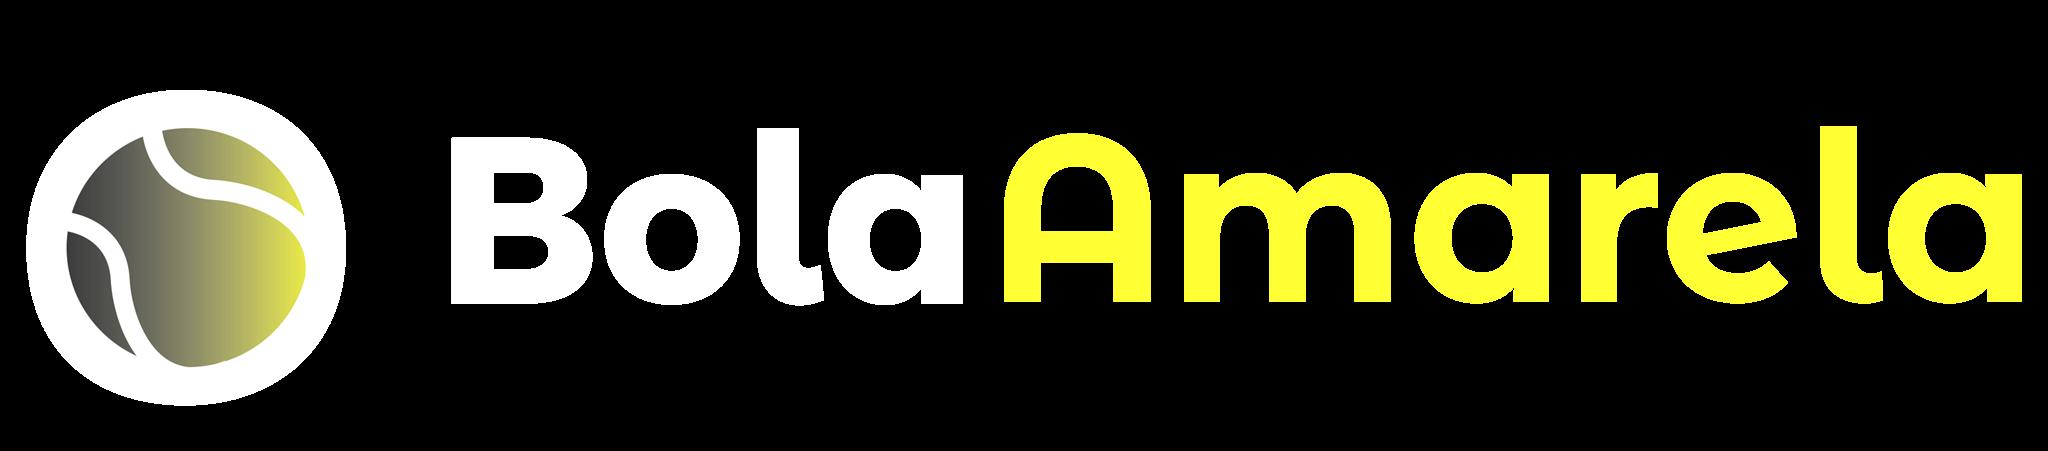 Bola Amarela logo